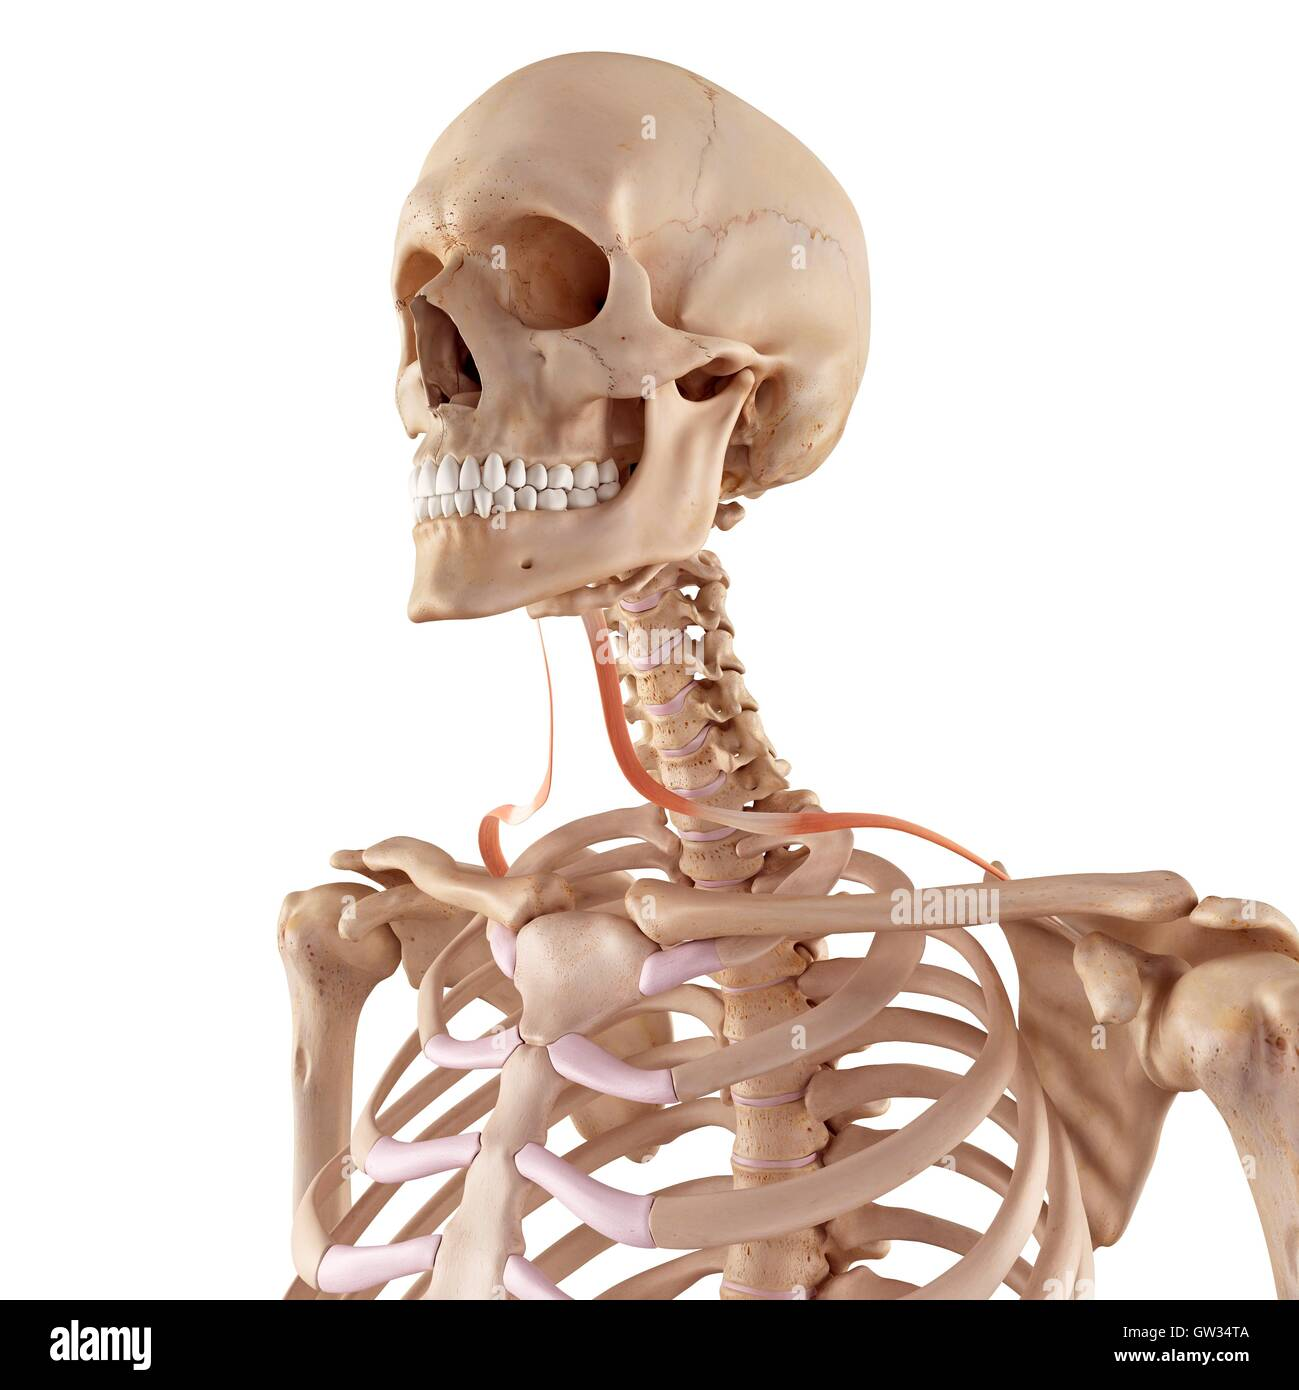 Human Neck Bones And Muscle Stock Photos Human Neck Bones And